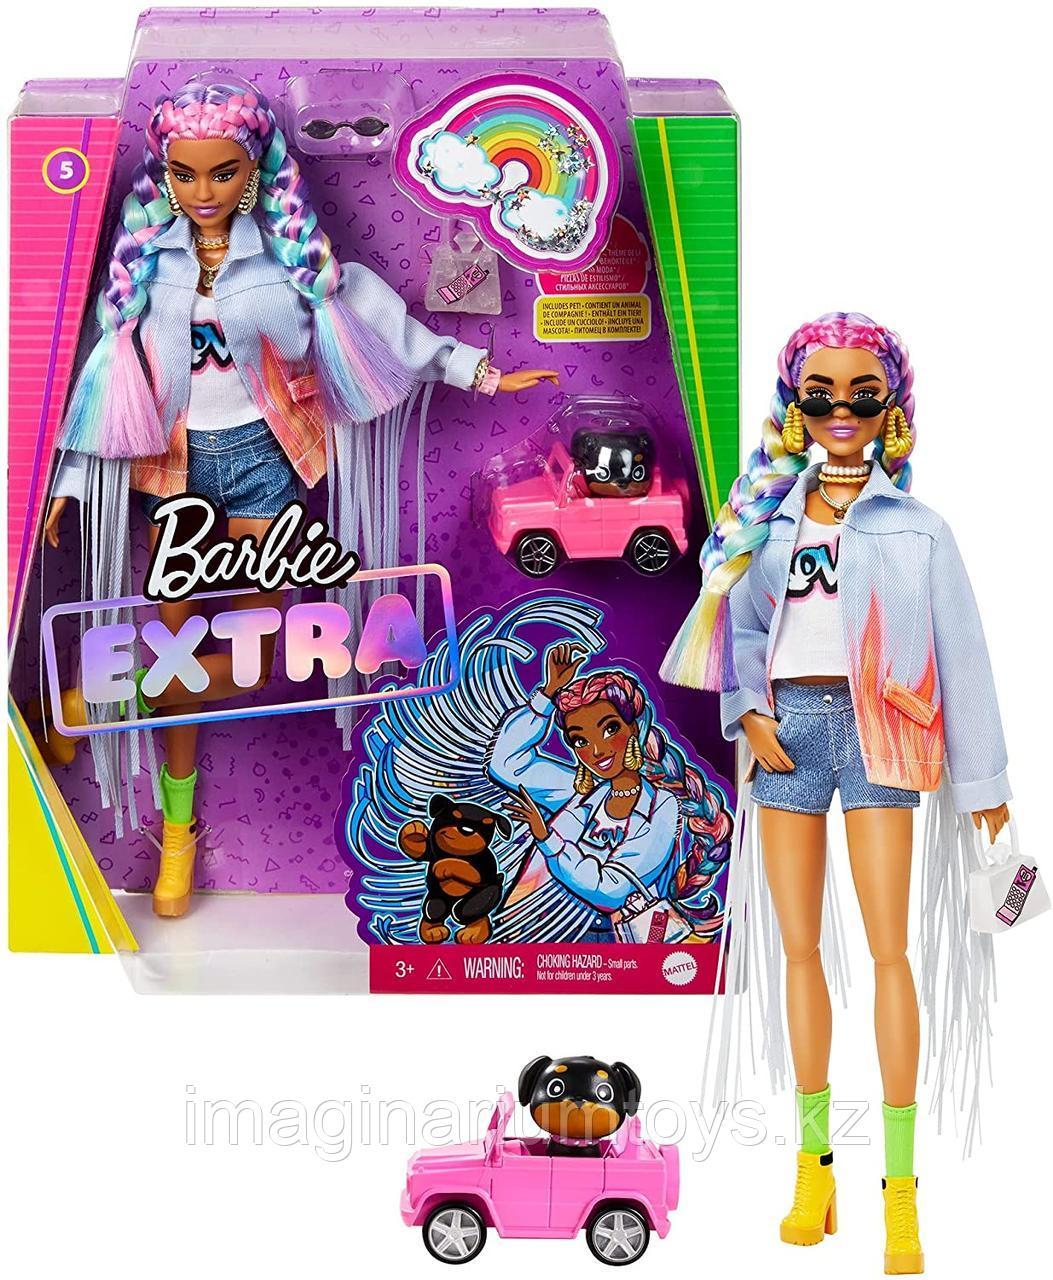 Кукла Barbie Extra с радужными косами